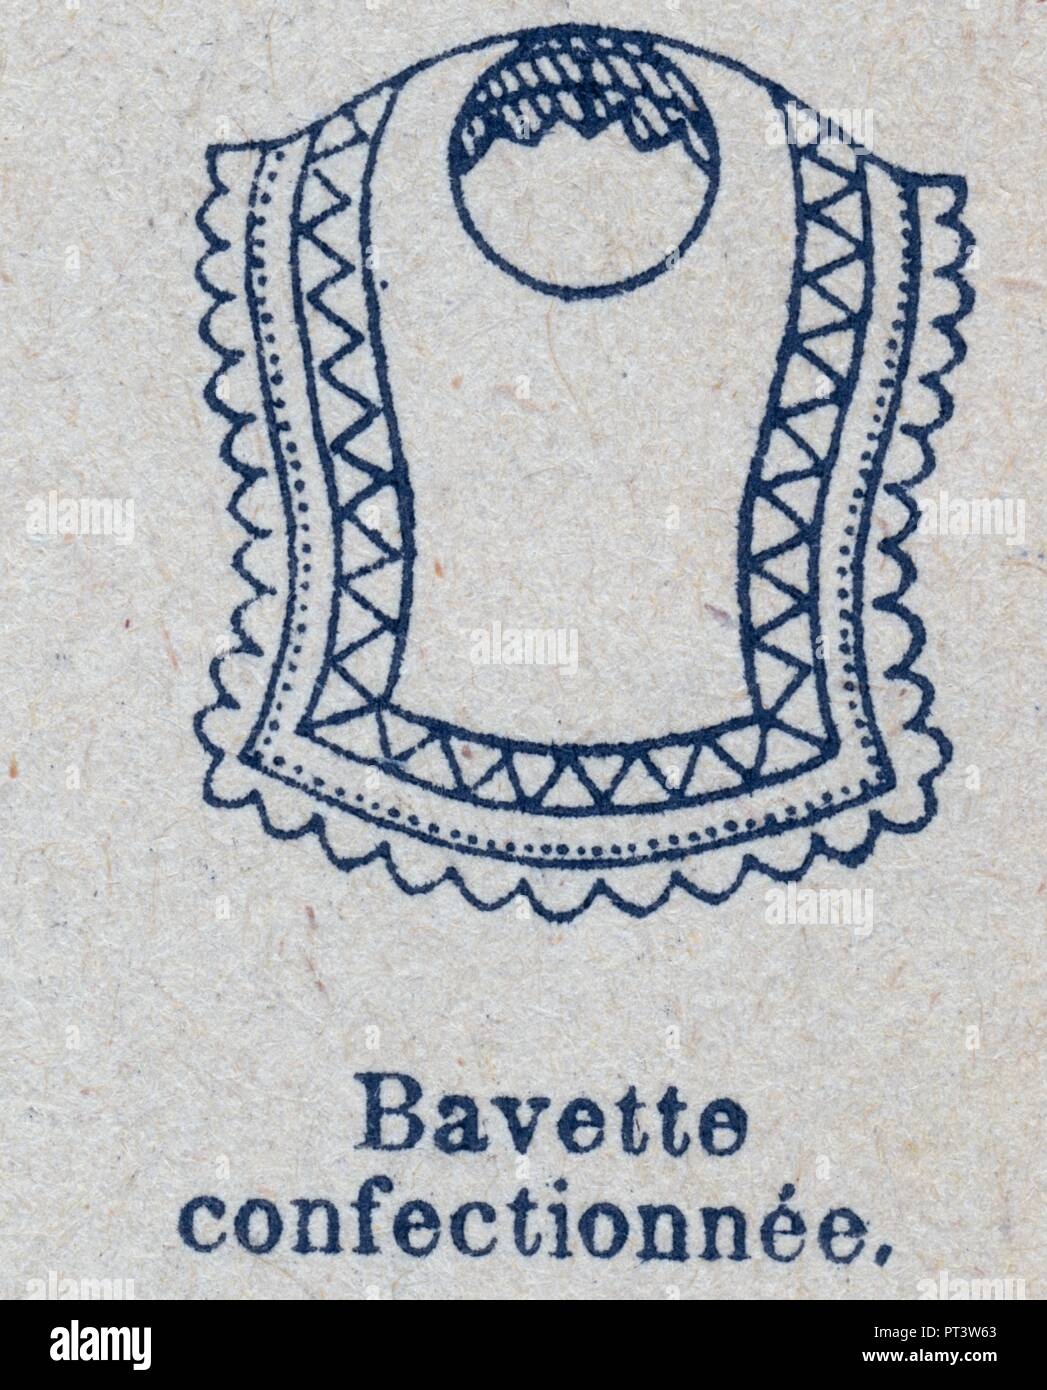 BAVETTE CONFECTIONNEE Stock Photo